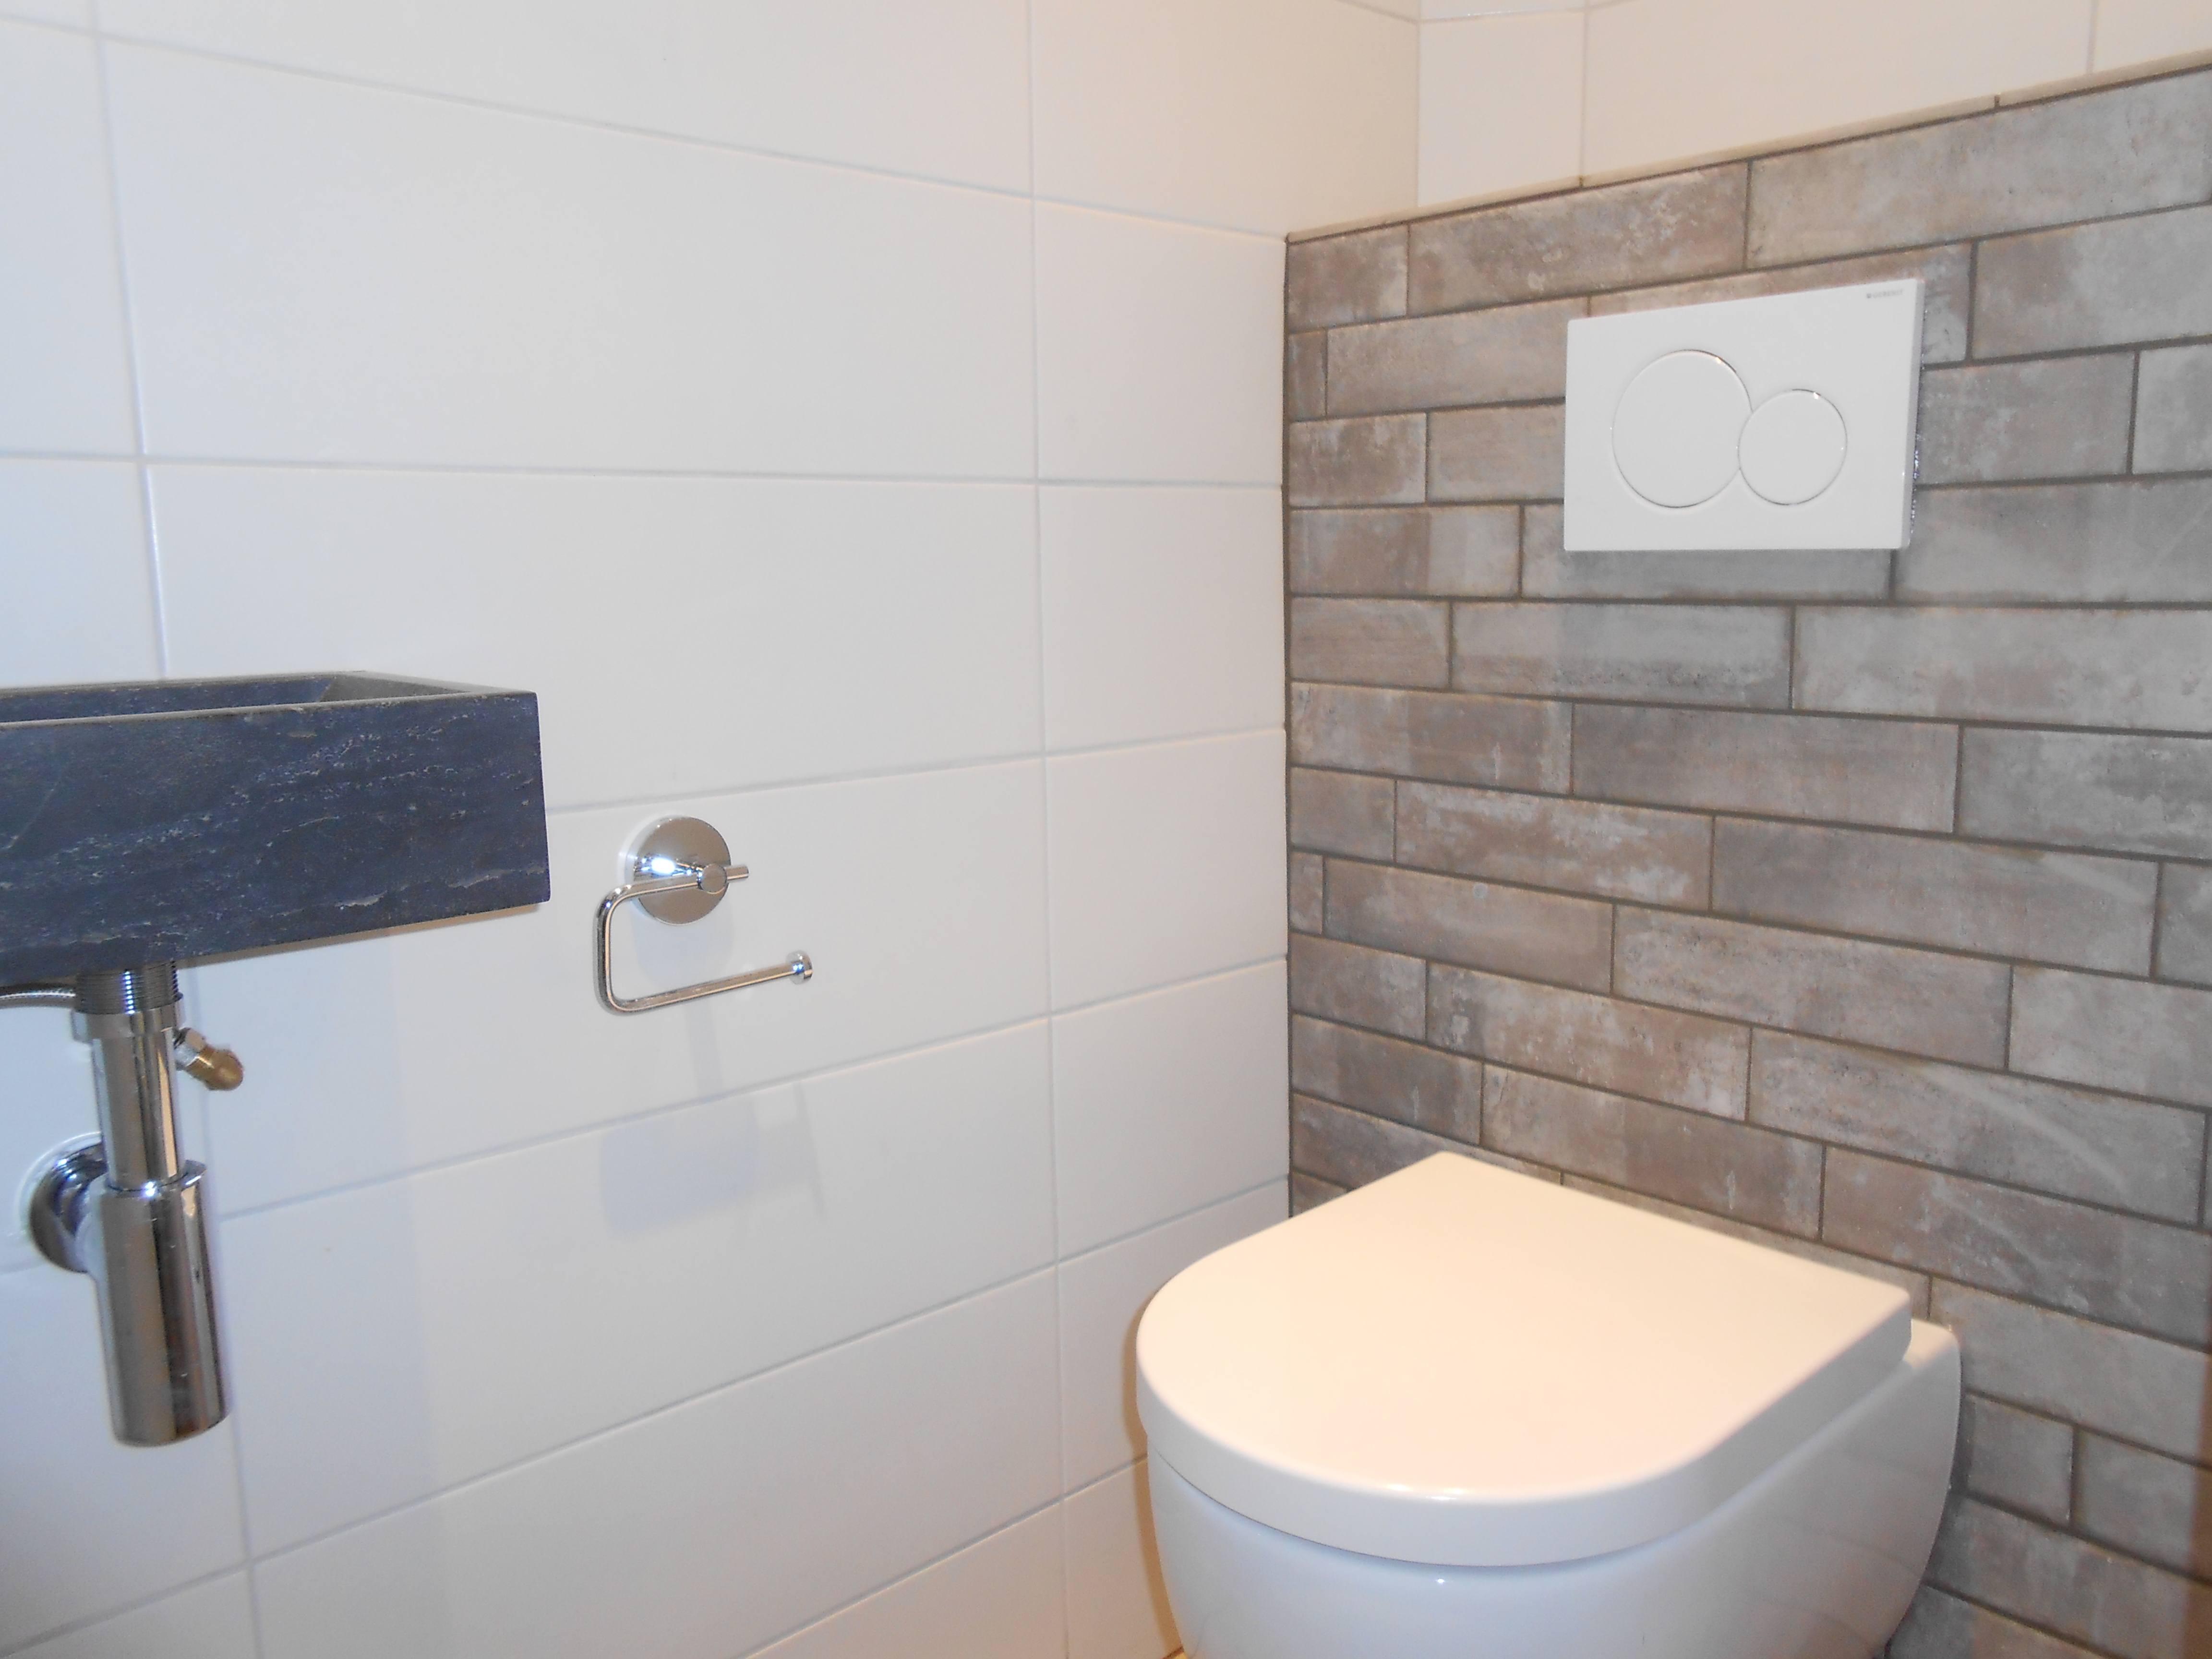 Schema installeren toilet dag 4